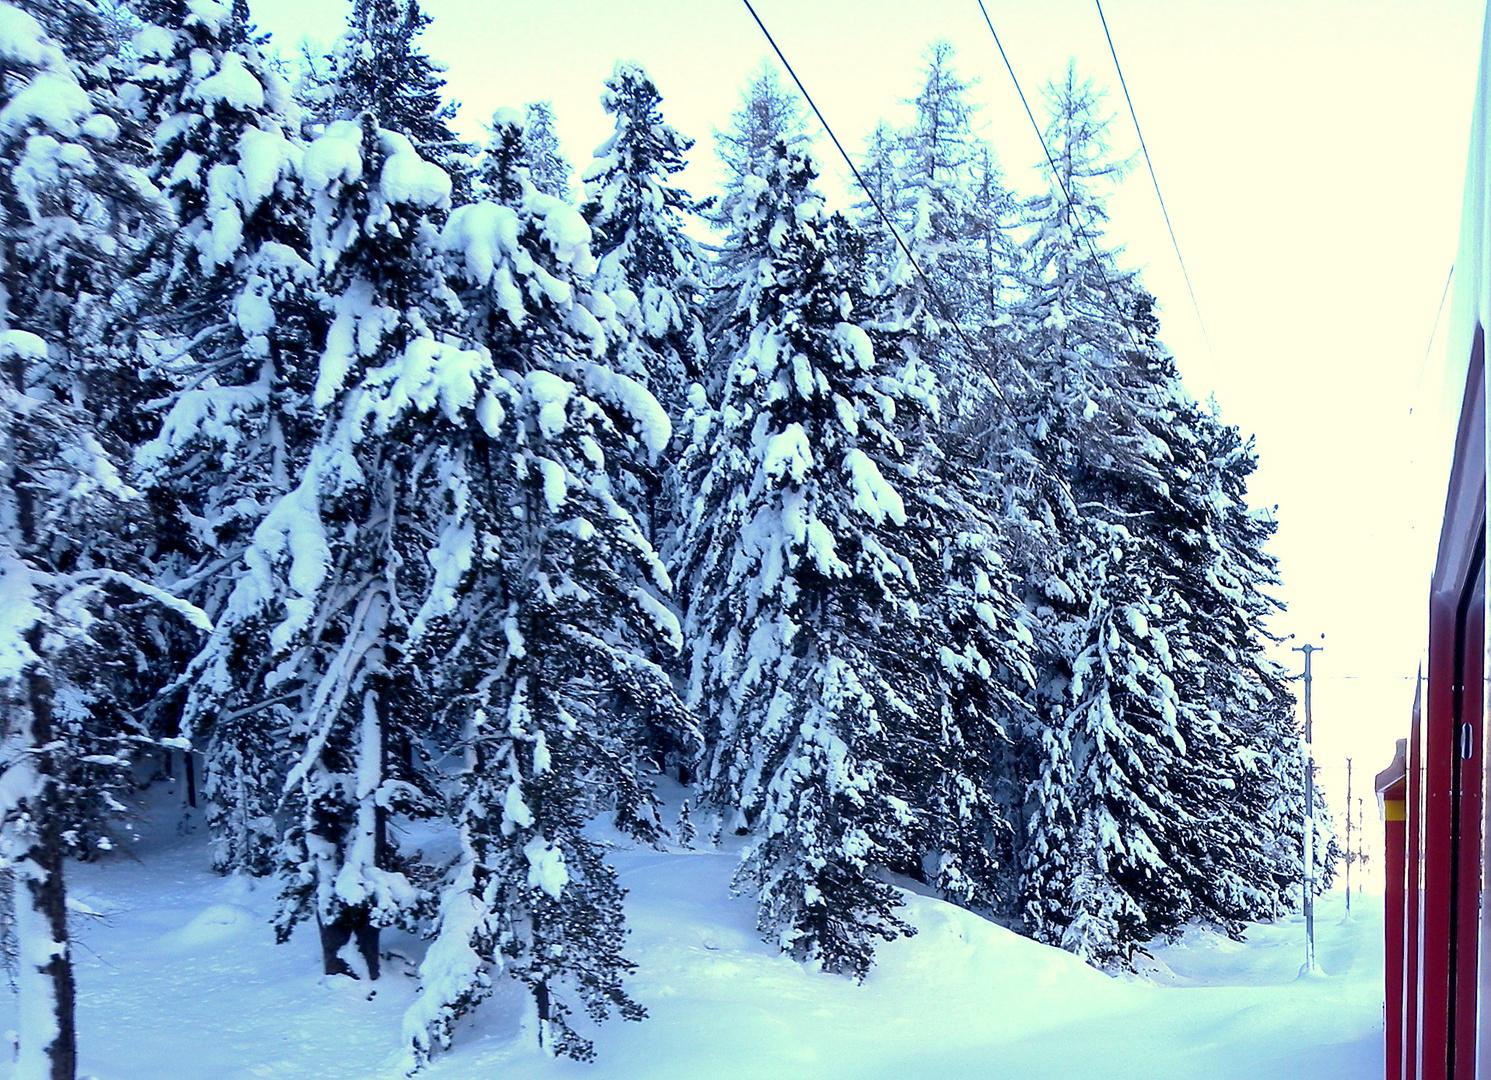 neige..neige / nieve..nieve / Schnee..Schnee..01